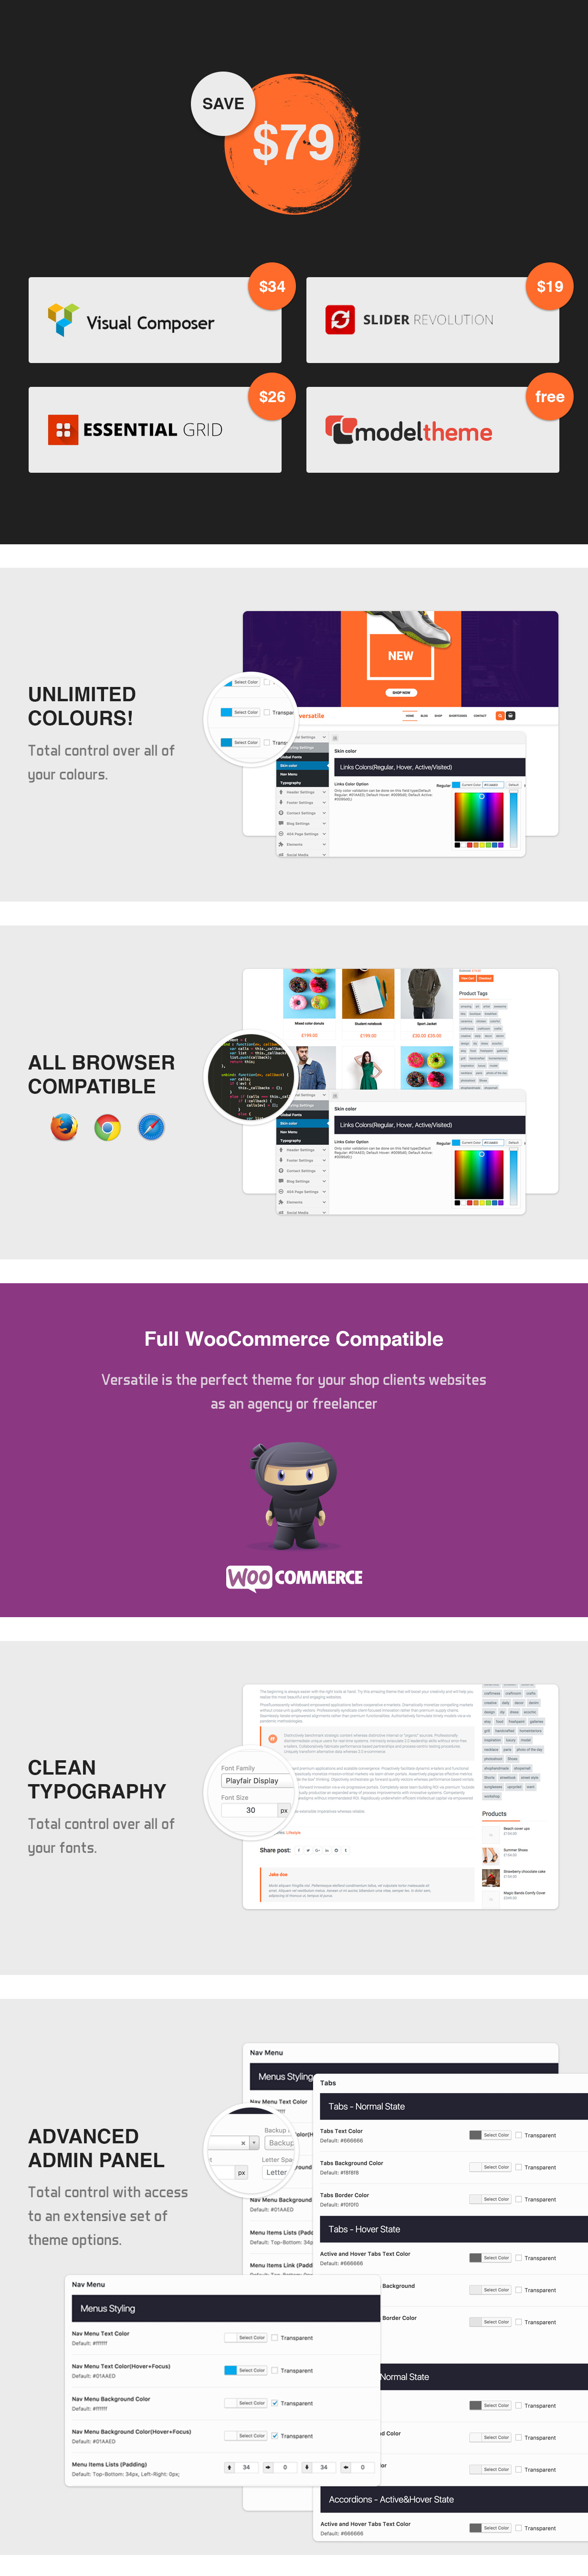 Versatile - Multipurpose WooCommerce WordPress Theme - 7